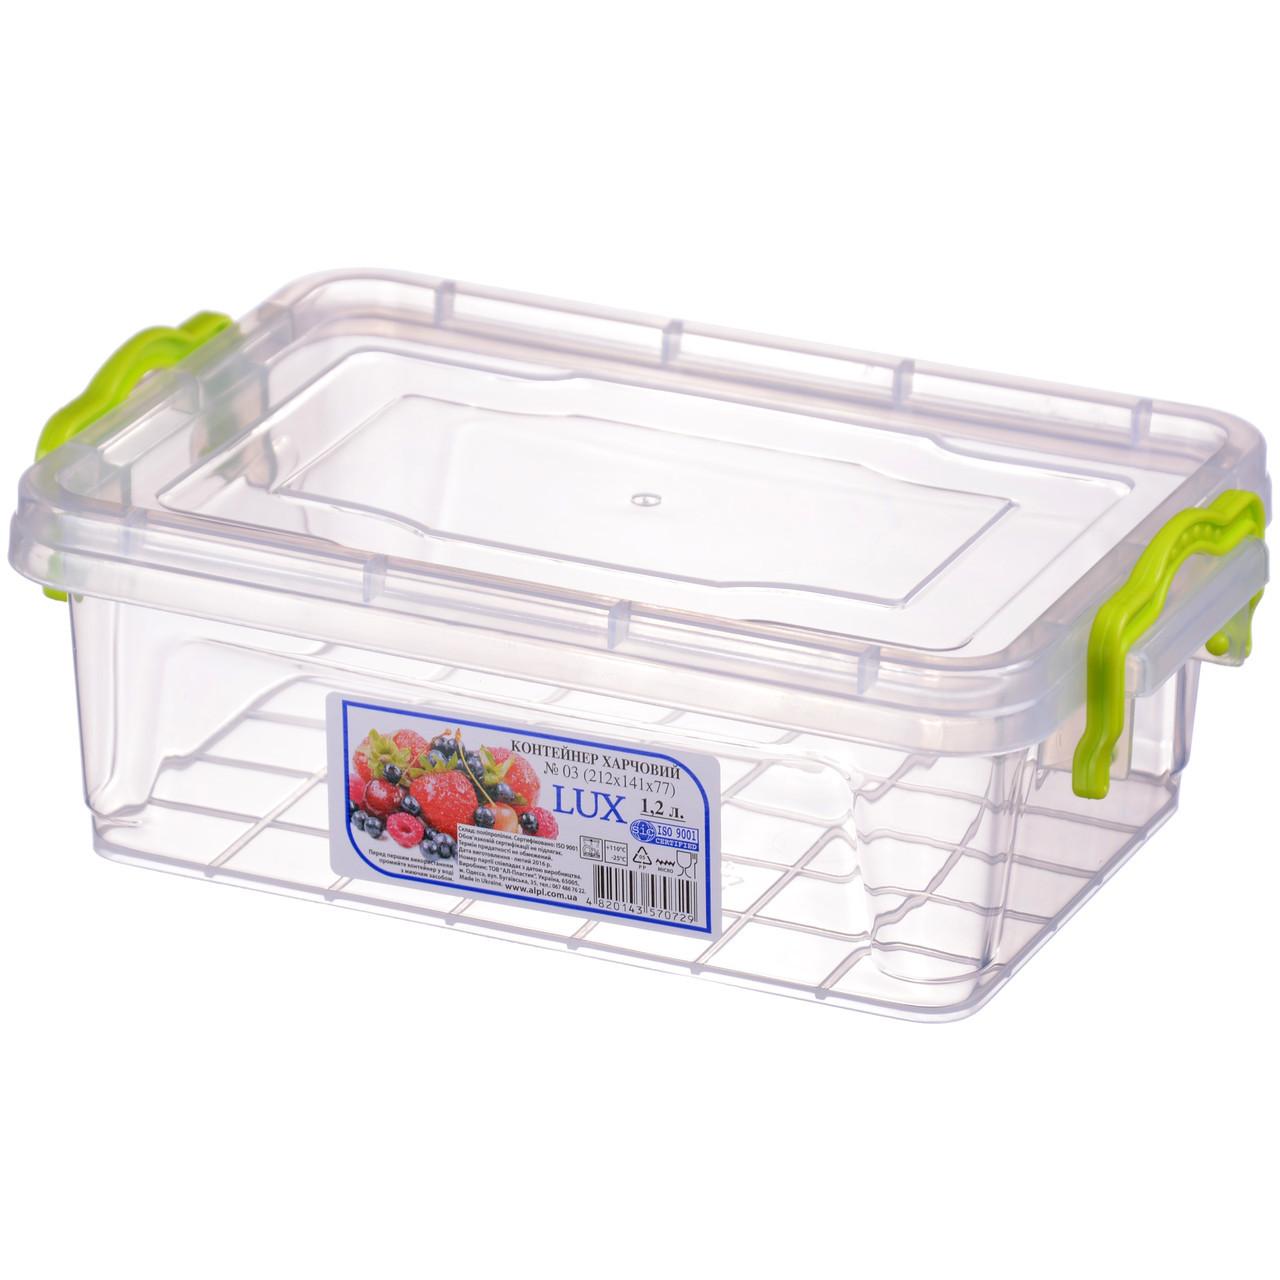 Контейнер пищевой Ал-Пластик Lux №3 (1.2л)